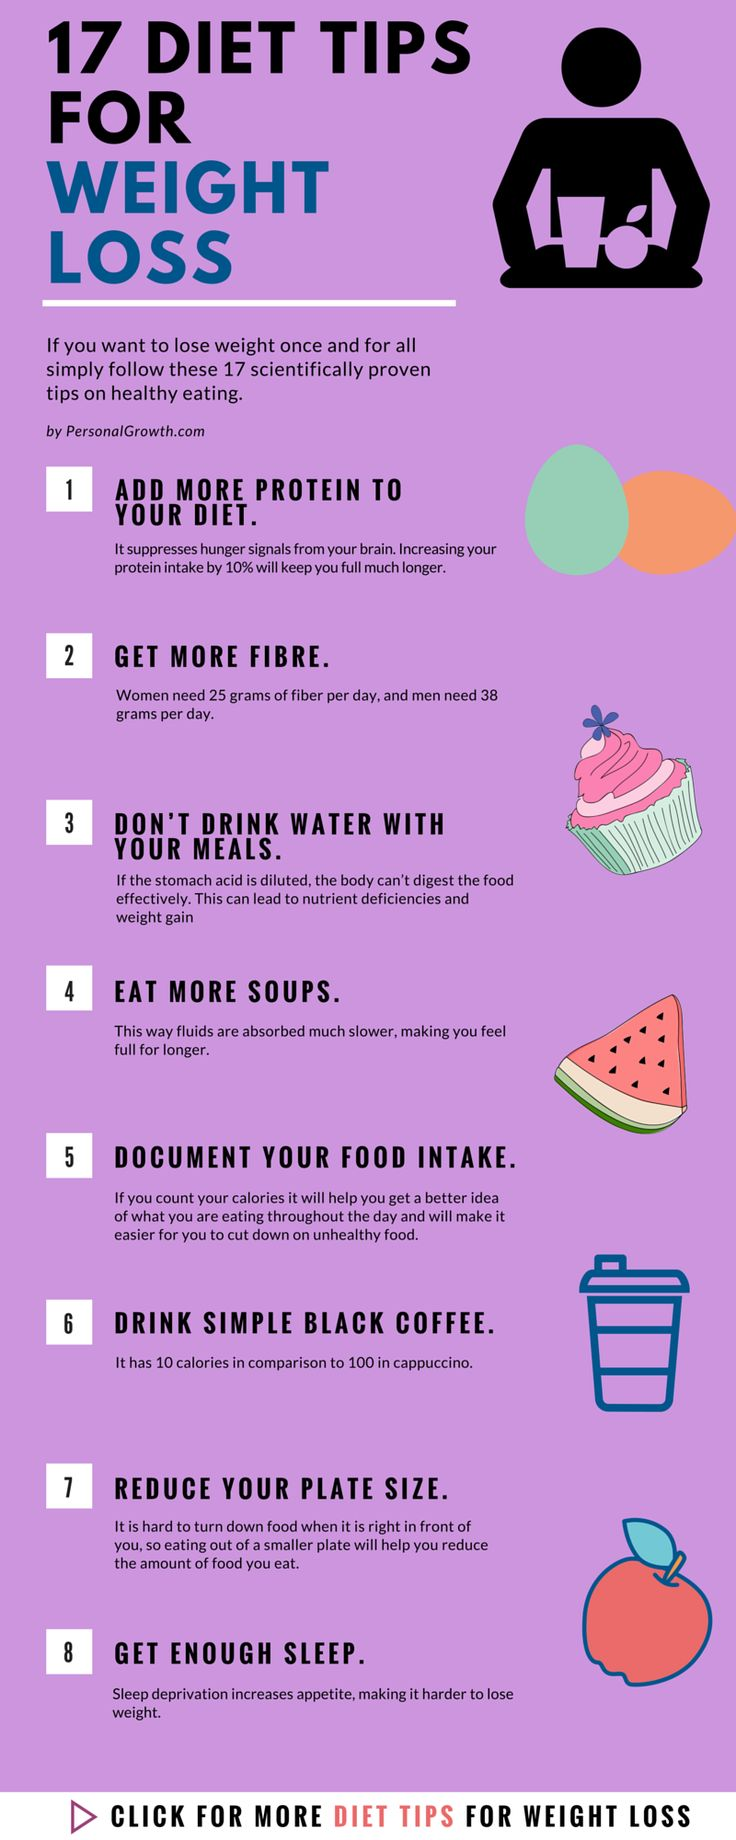 17 Diet Tips To Lose Weight #weightloss #weightlosstips